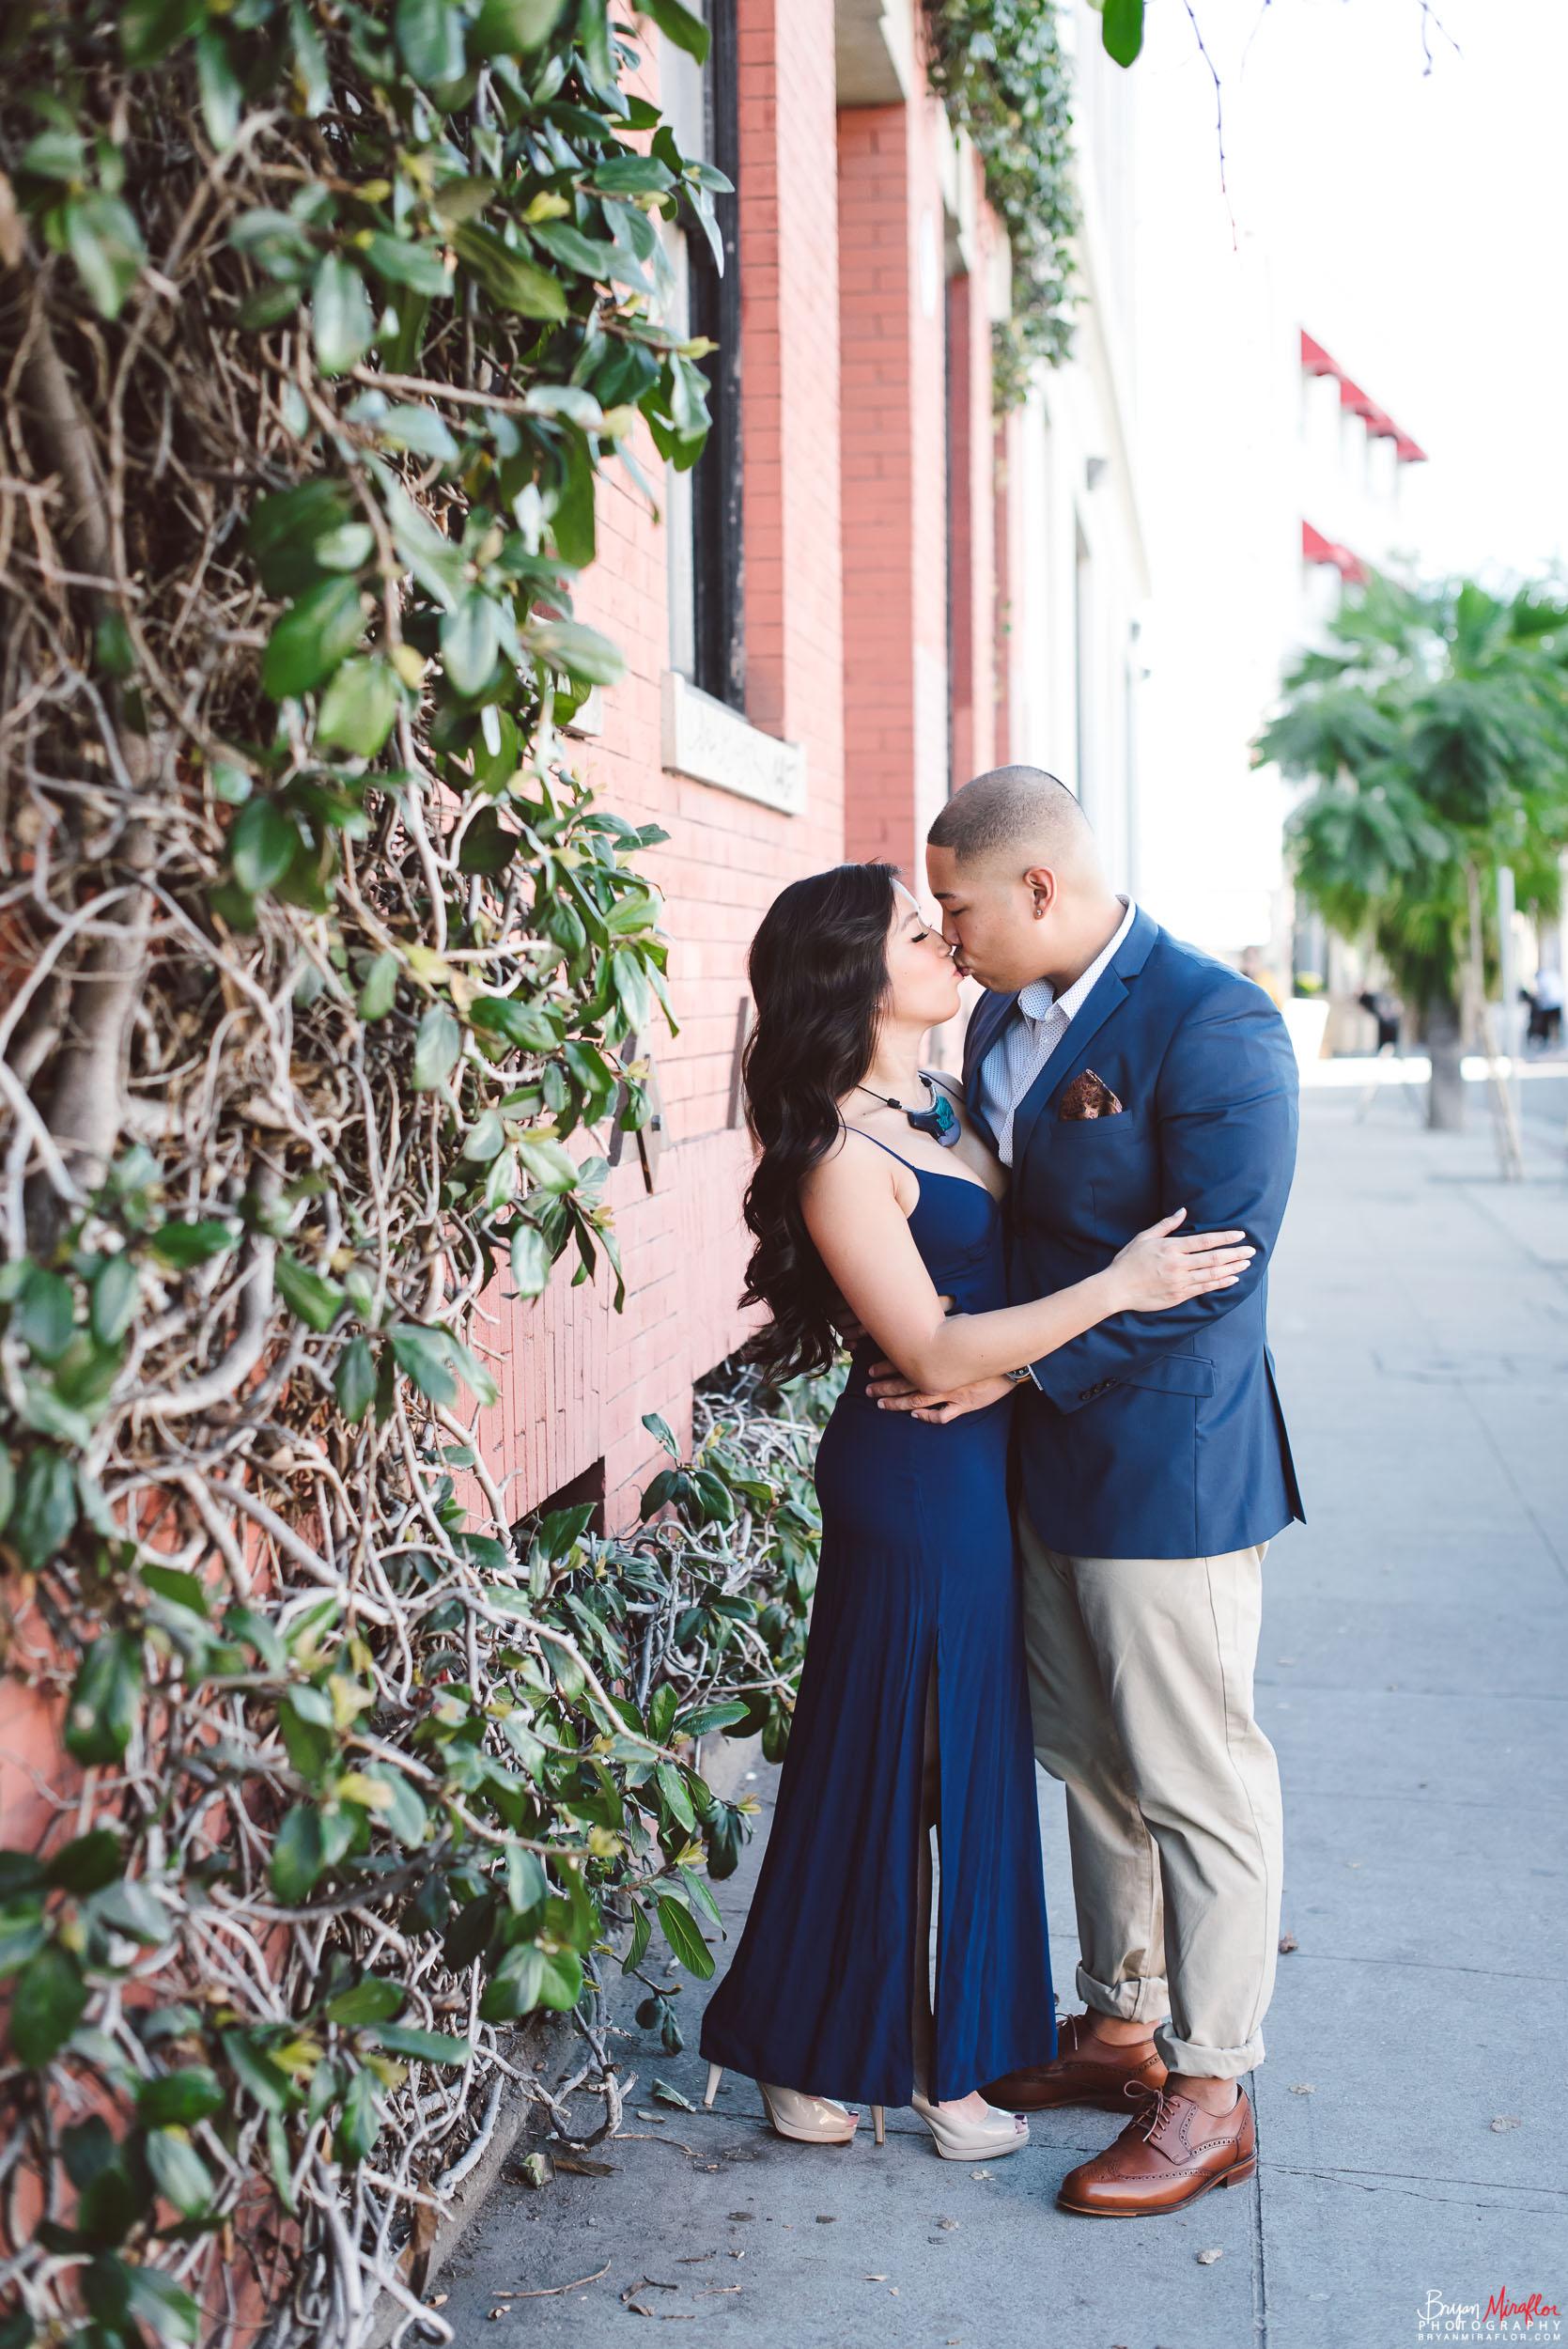 Bryan-Miraflor-Photography-Trisha-Dexter-Lopez-Engagement-Formal-DTLA-Arts-20170129-0009.jpg